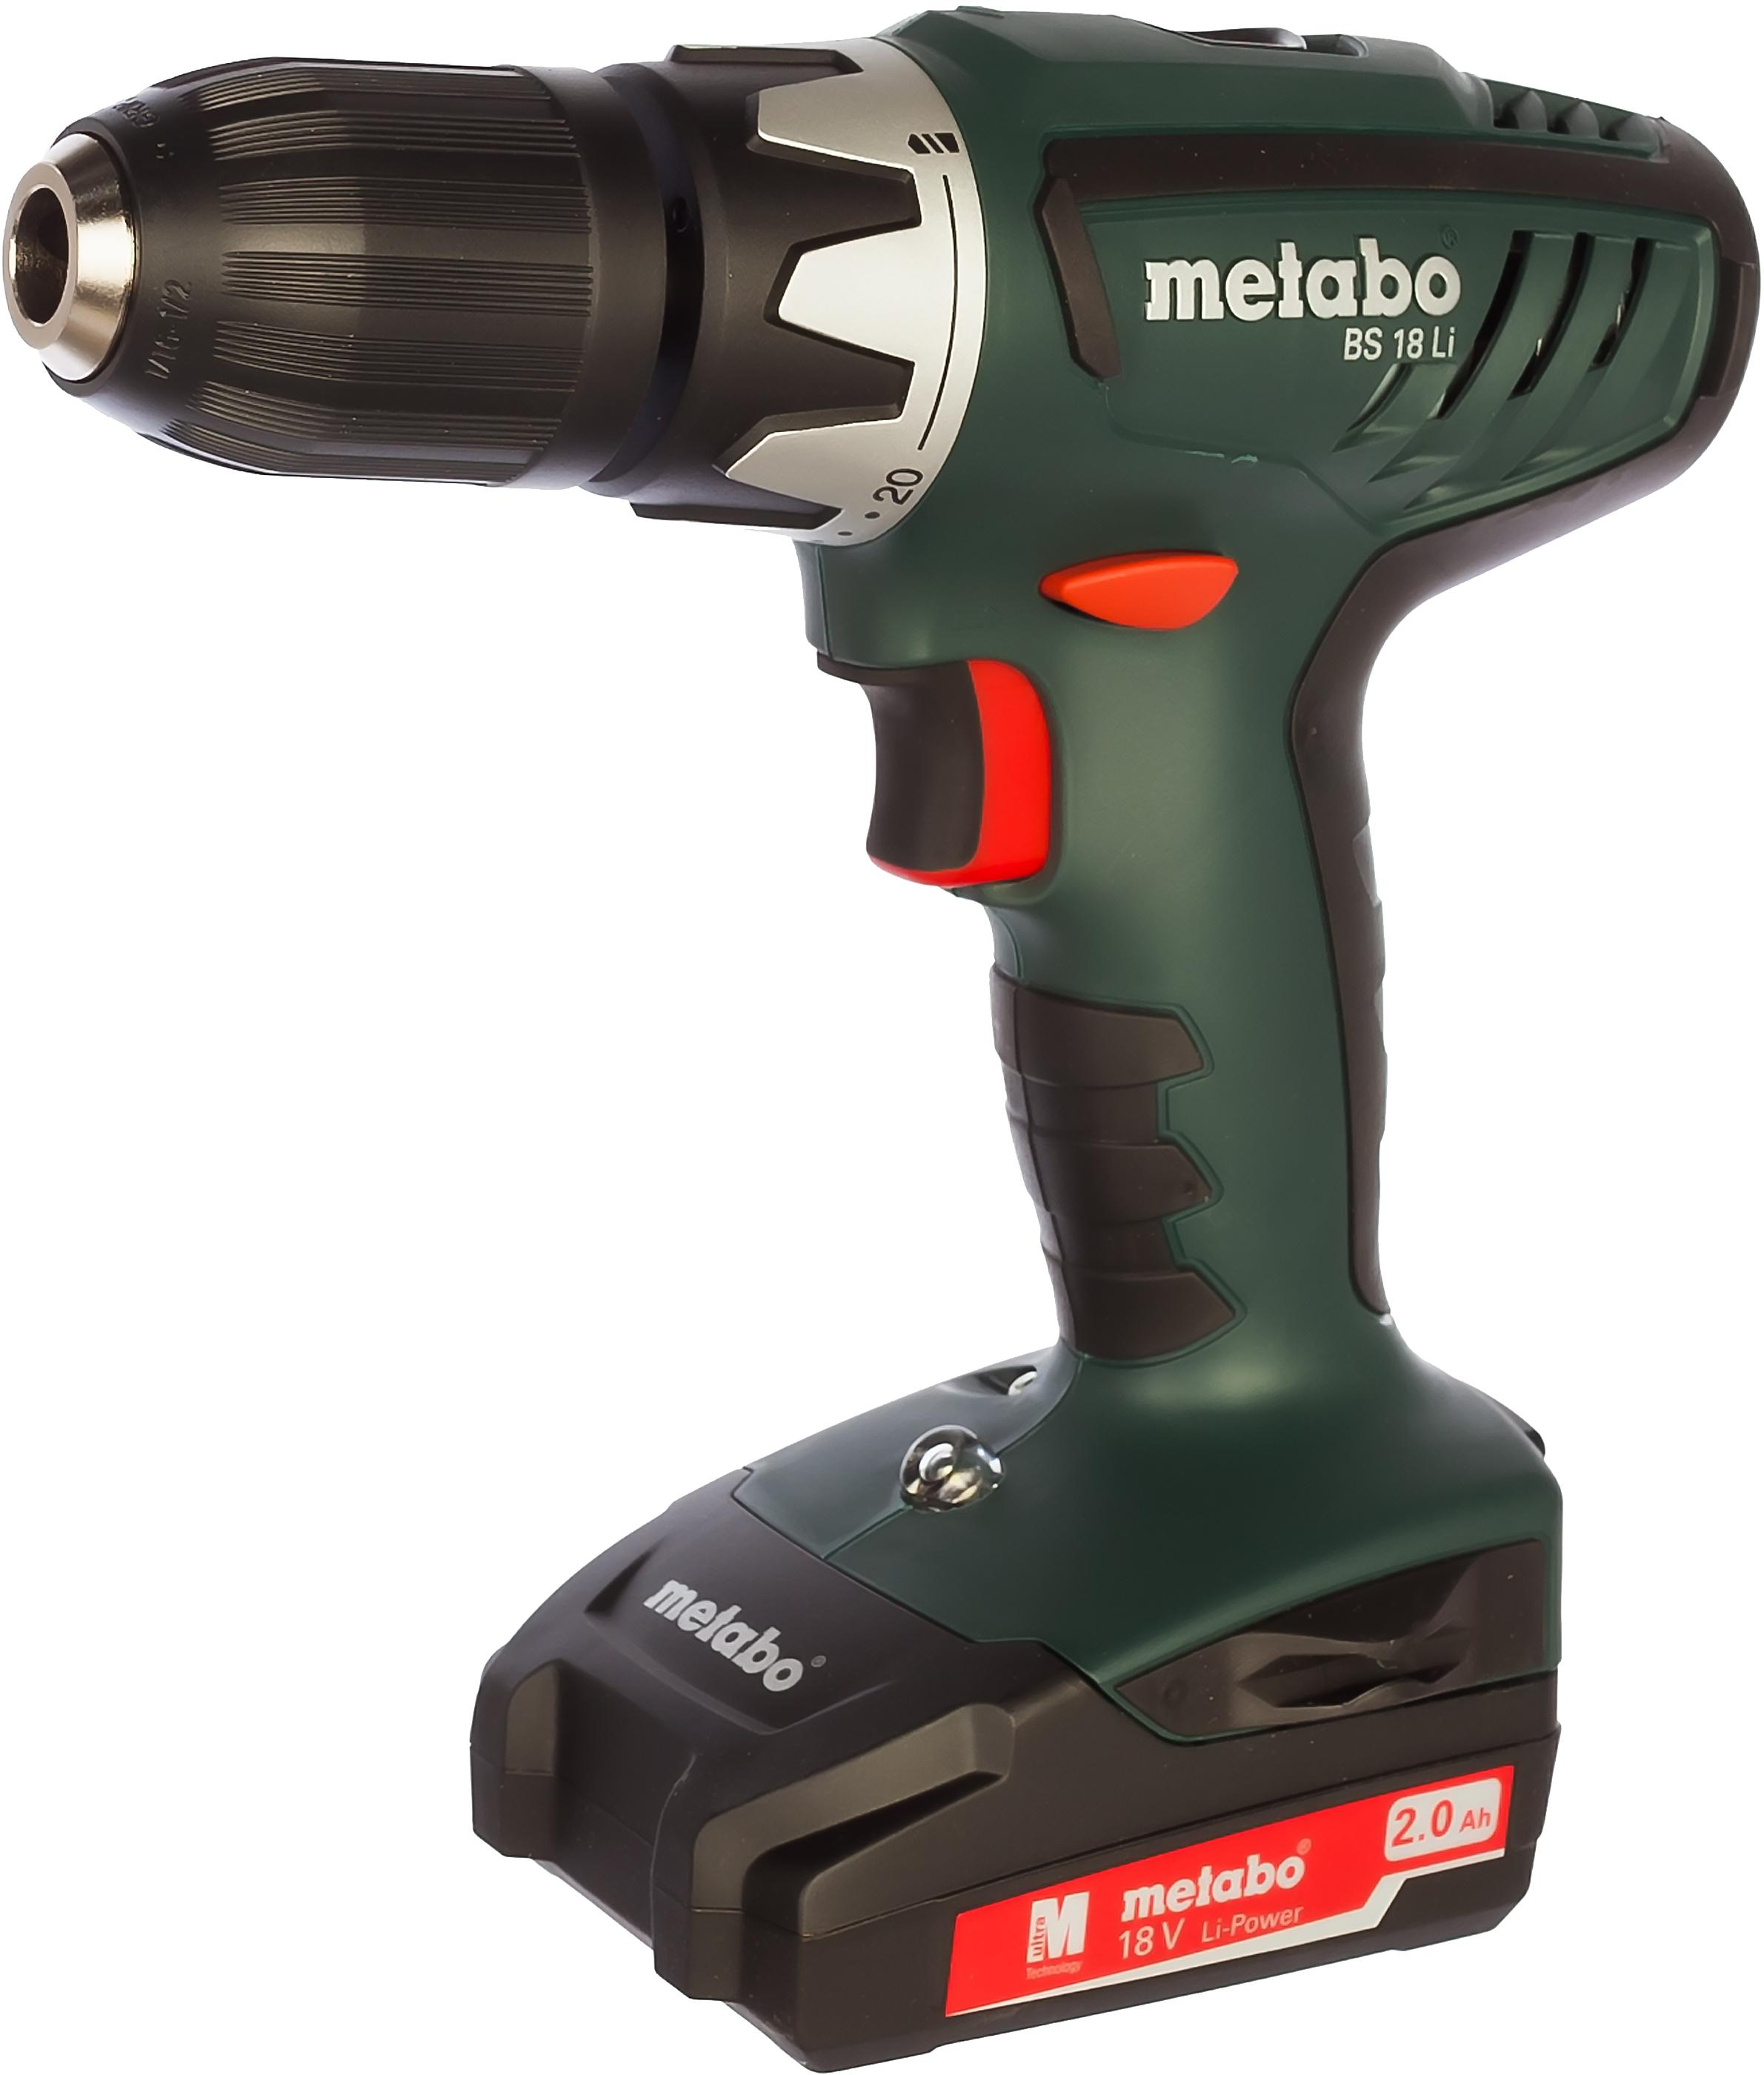 Дрель аккумуляторная Metabo Bs 18 li (602116530) электроинструмент metabo bs18li 2х2 0 13mm sc60 602116530